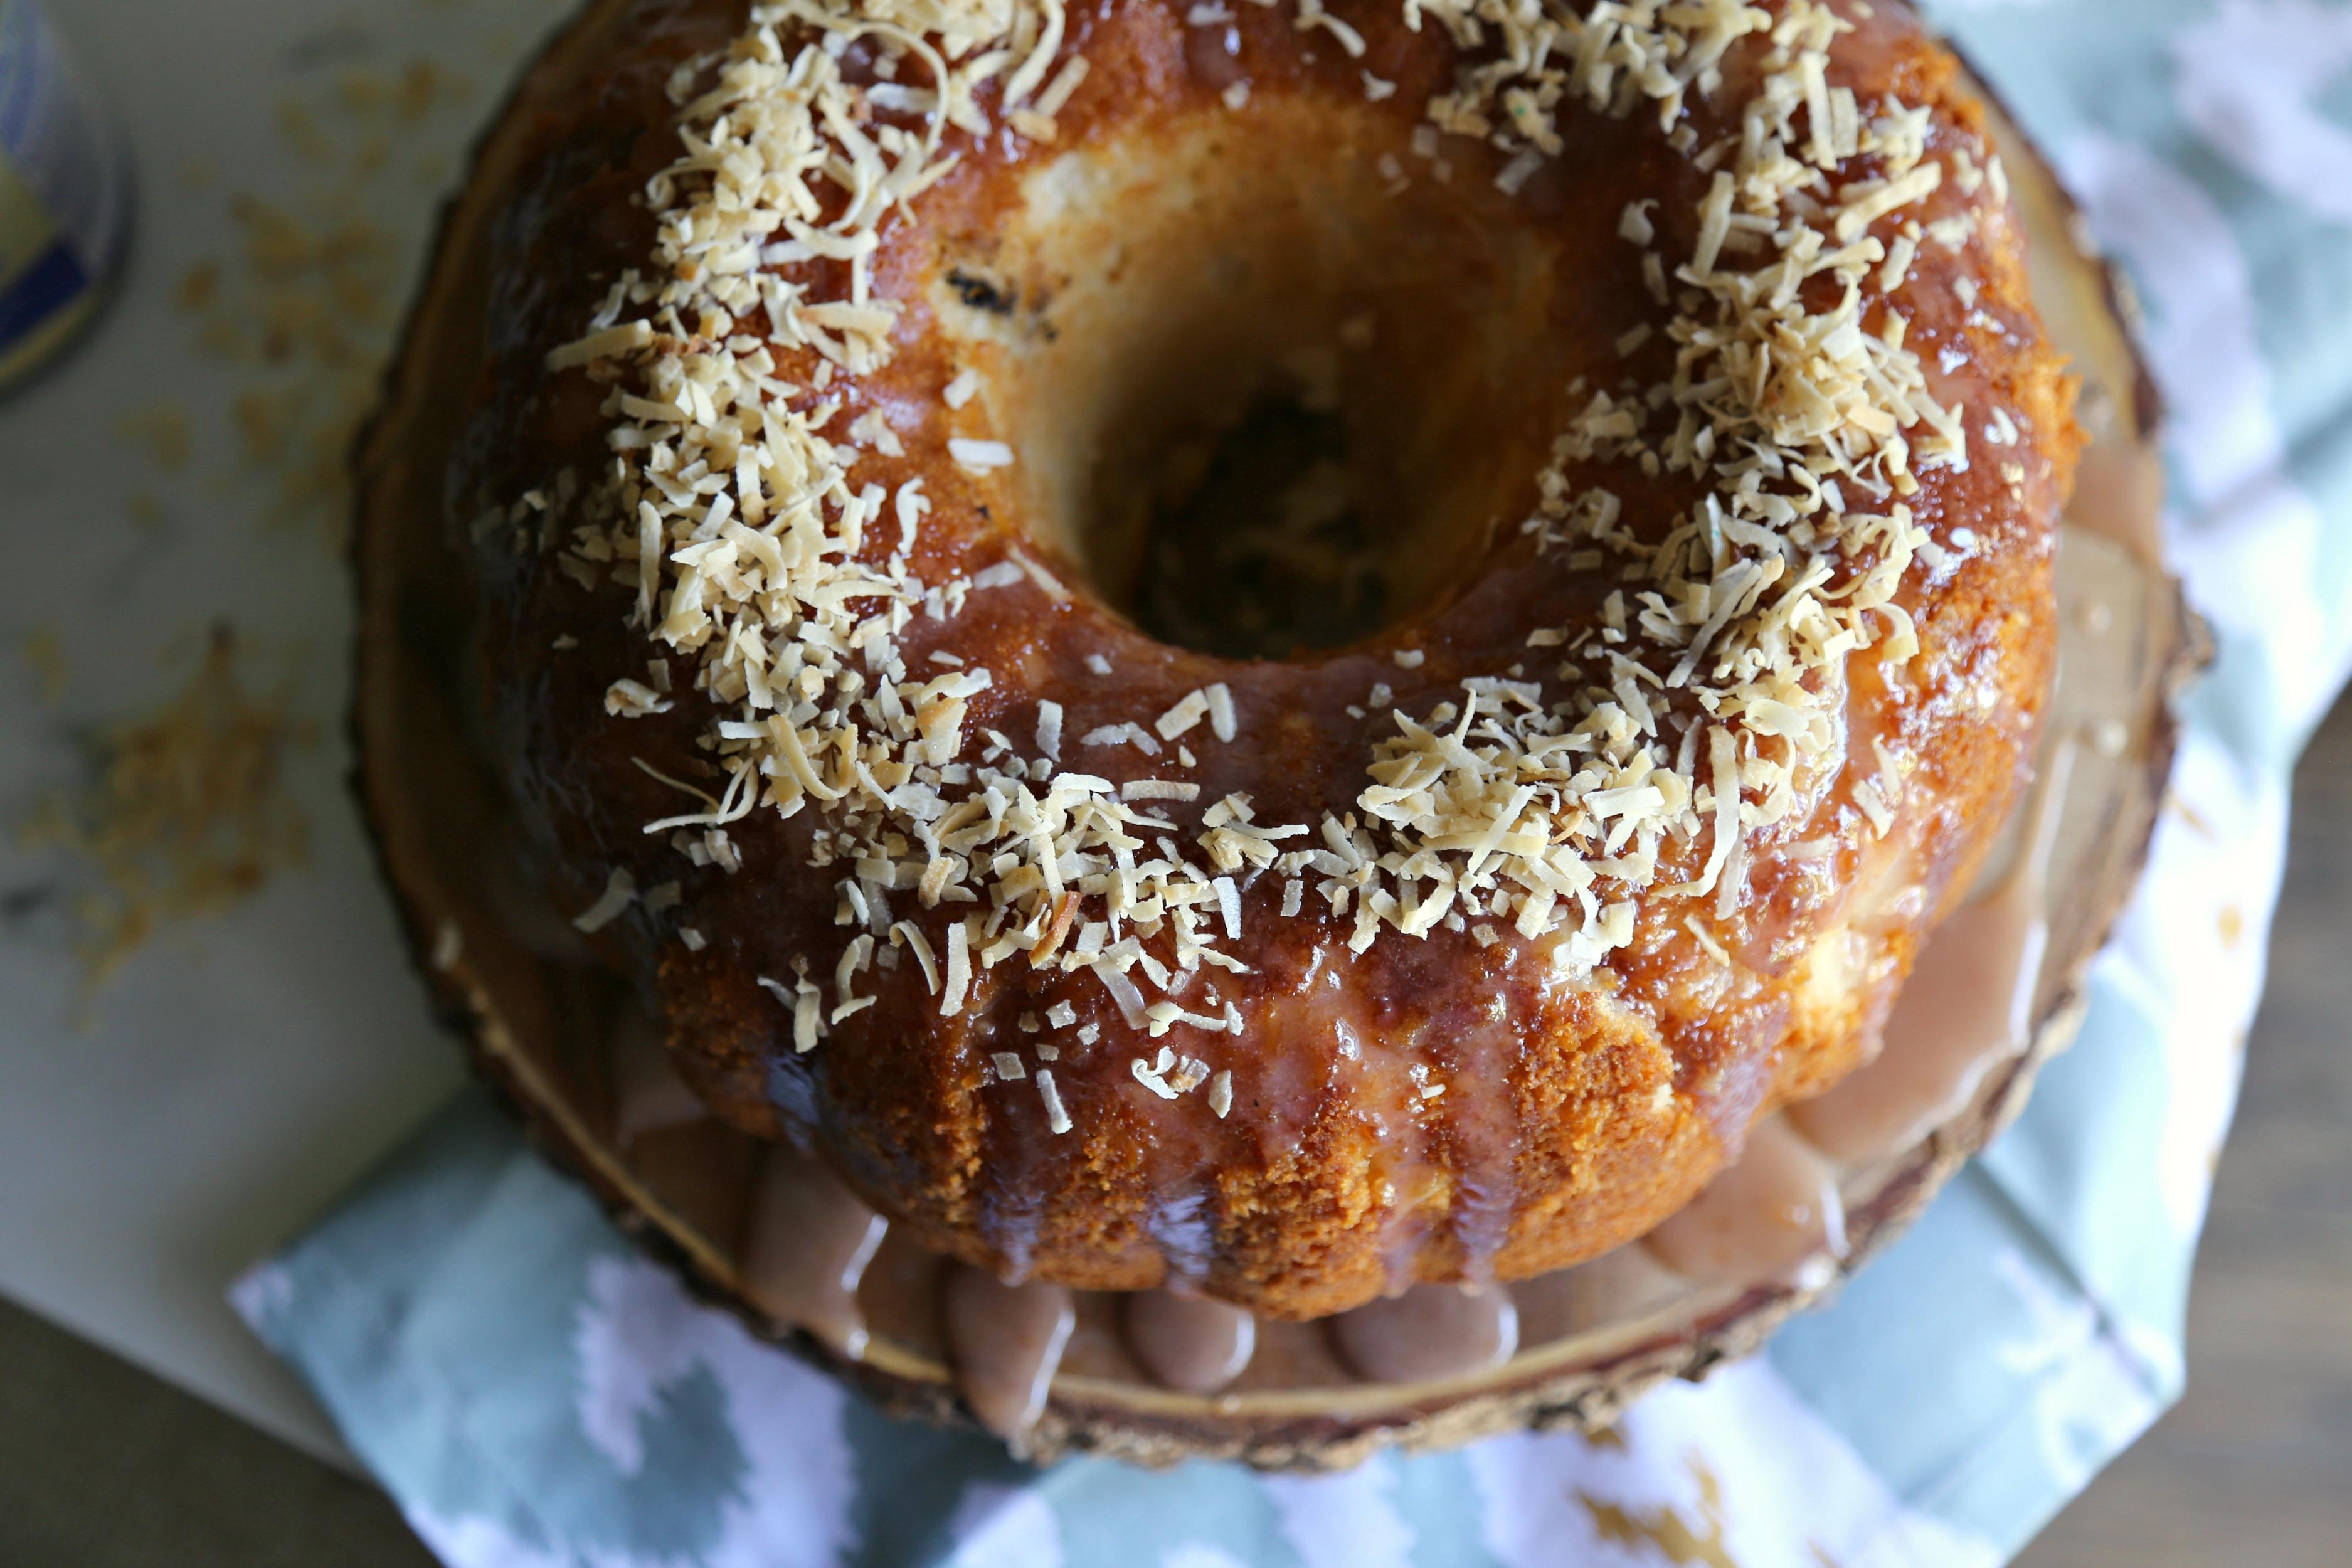 coconut-bundt-cake-hibiscus-glaze-vianneyrodriguez-sweetlifebake